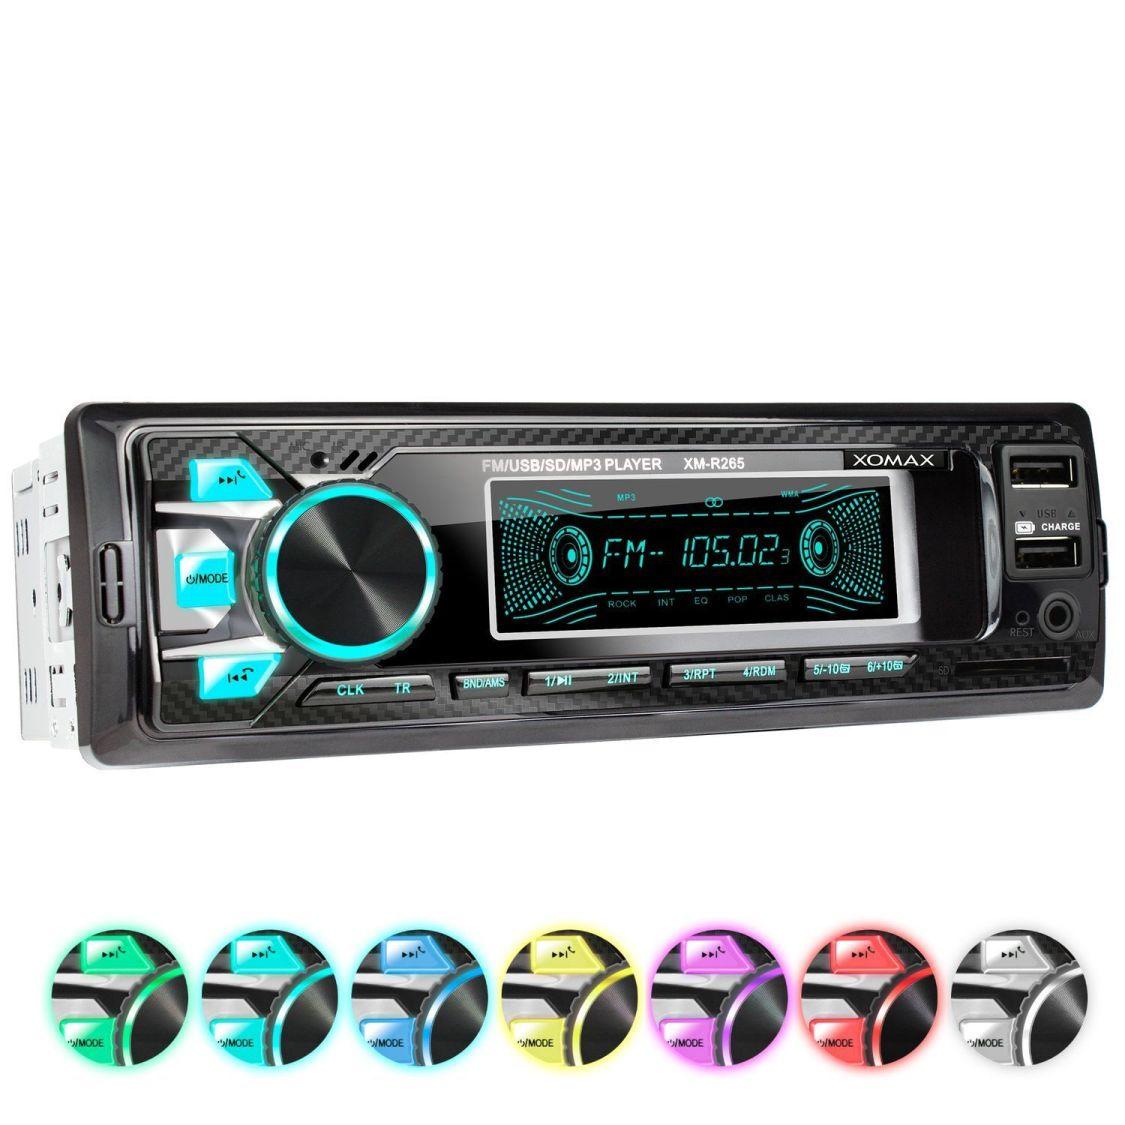 Autoradio mit Bluetooth Freisprech I 2x USB I SD AUX FM I 7 Farben I 1DIN I MP3